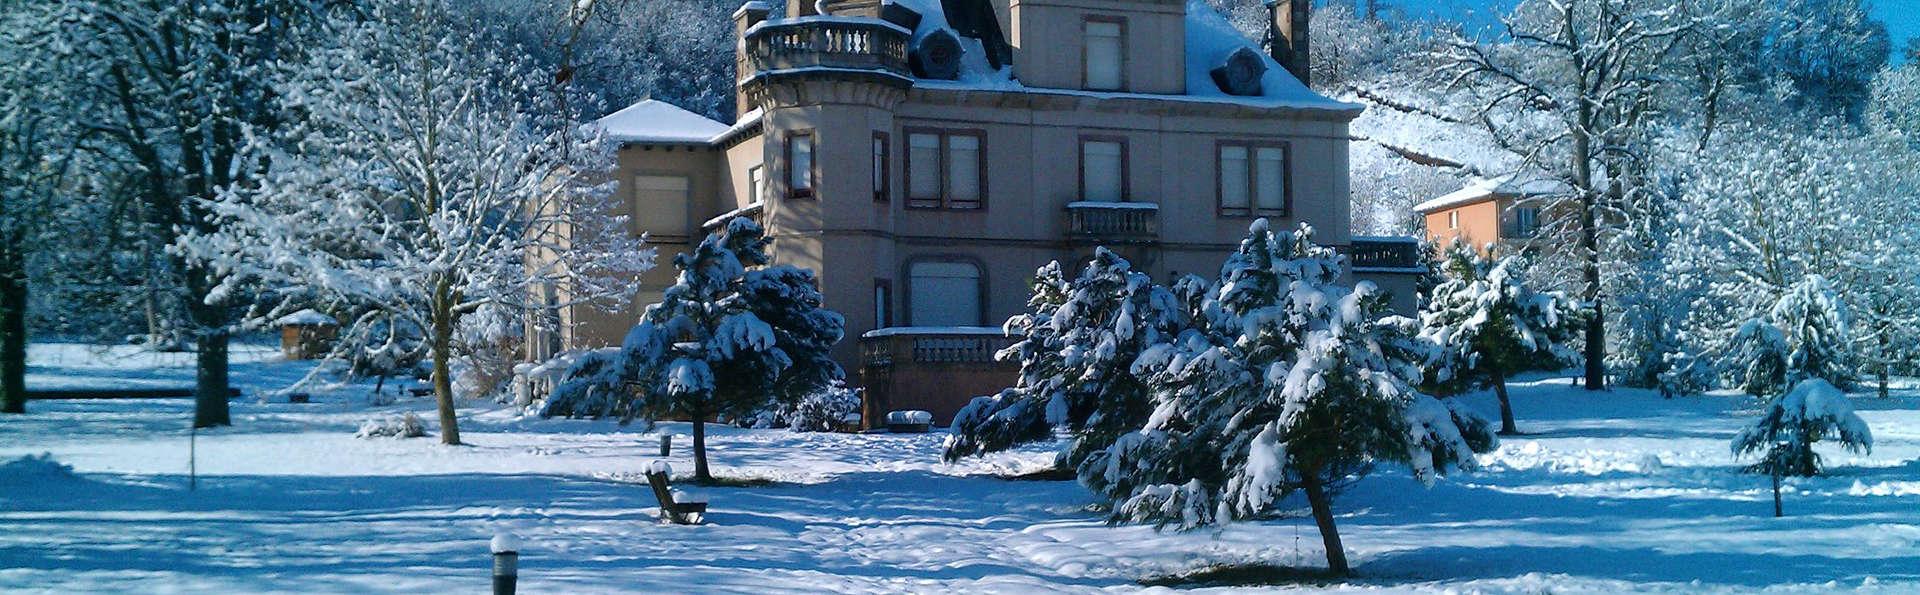 Hôtel Résidence du Rougier - EDIT-Fachada-1.jpg